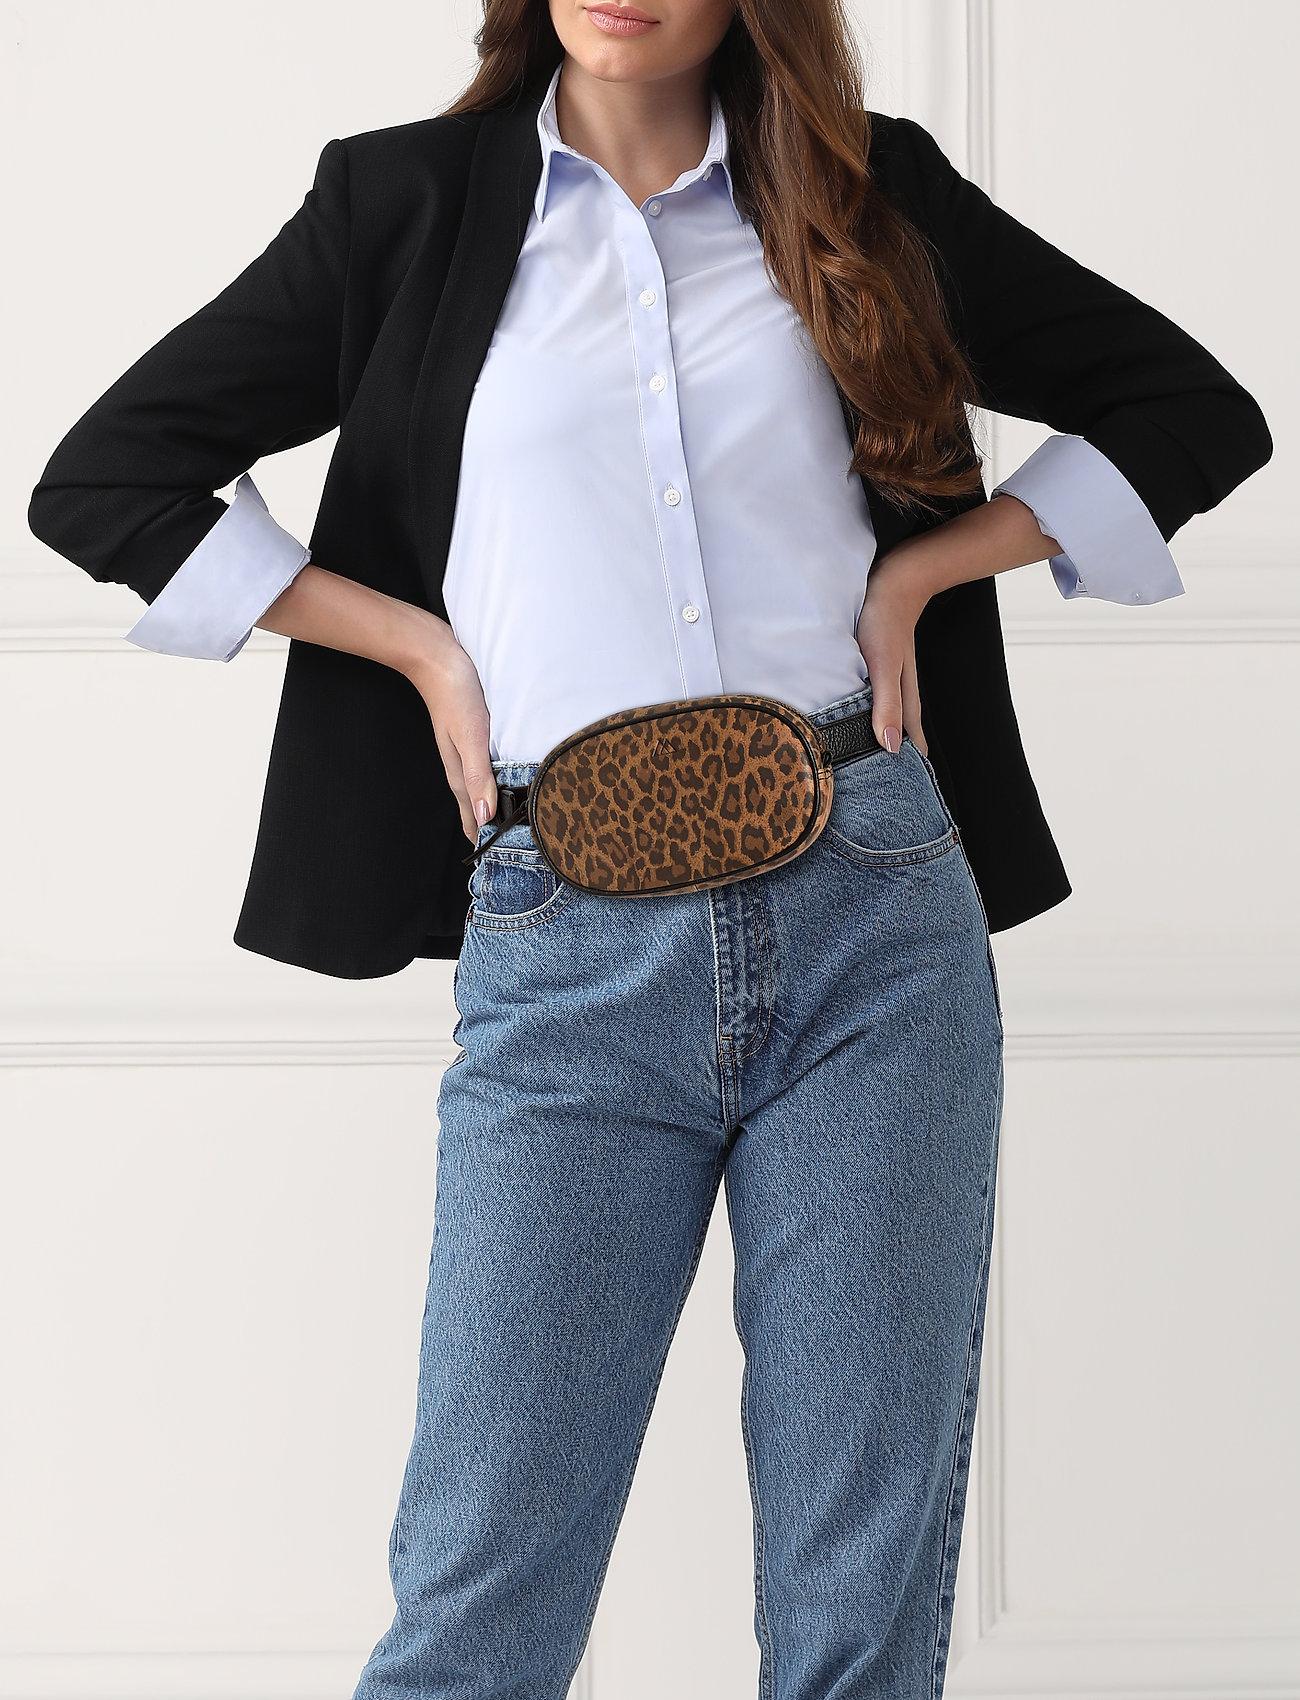 Markberg Eloise Bum Bag, Leopard - LEOPARD